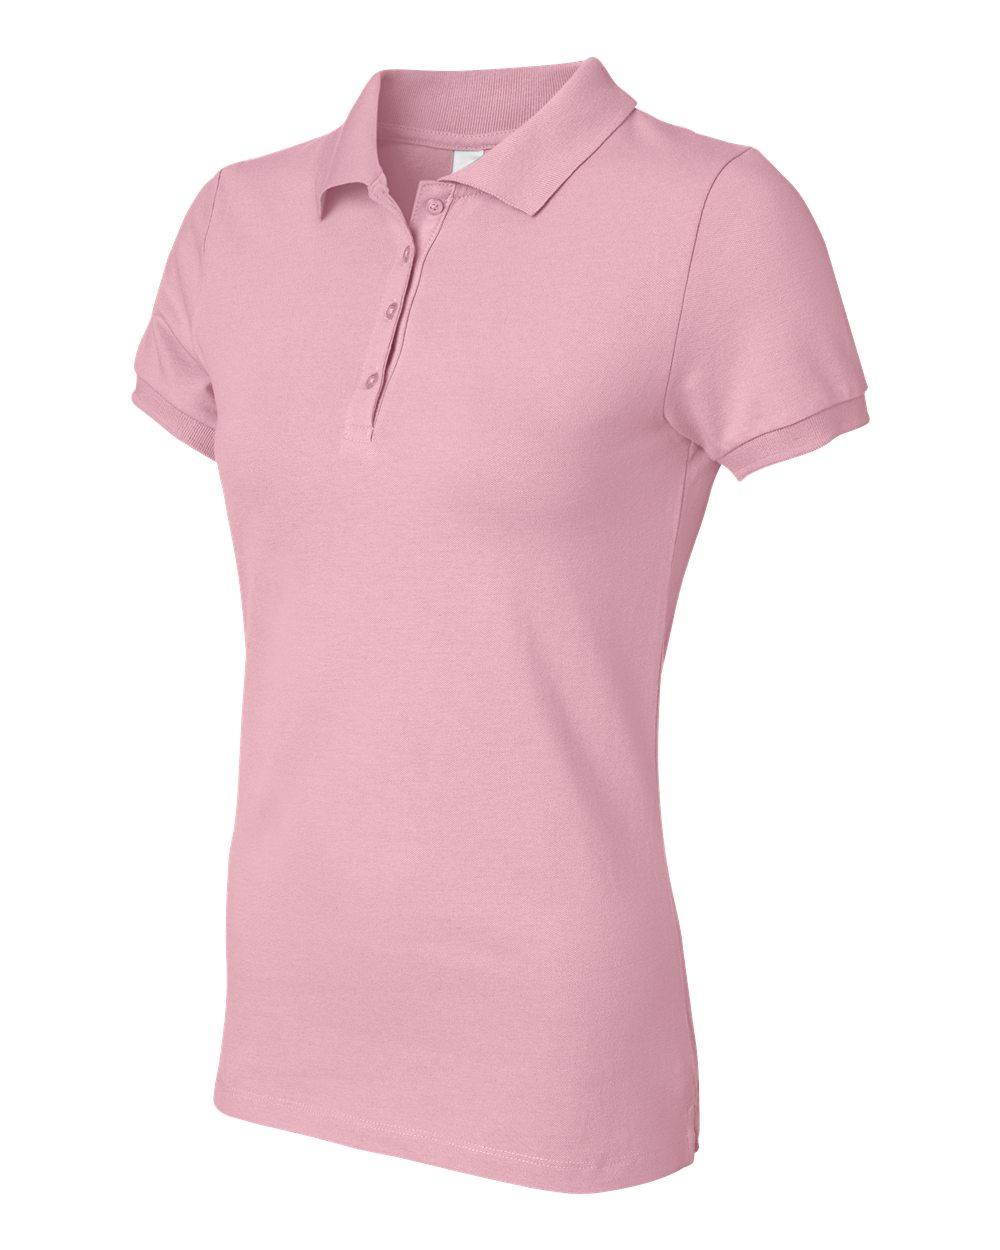 Bella 750 Soft Pink